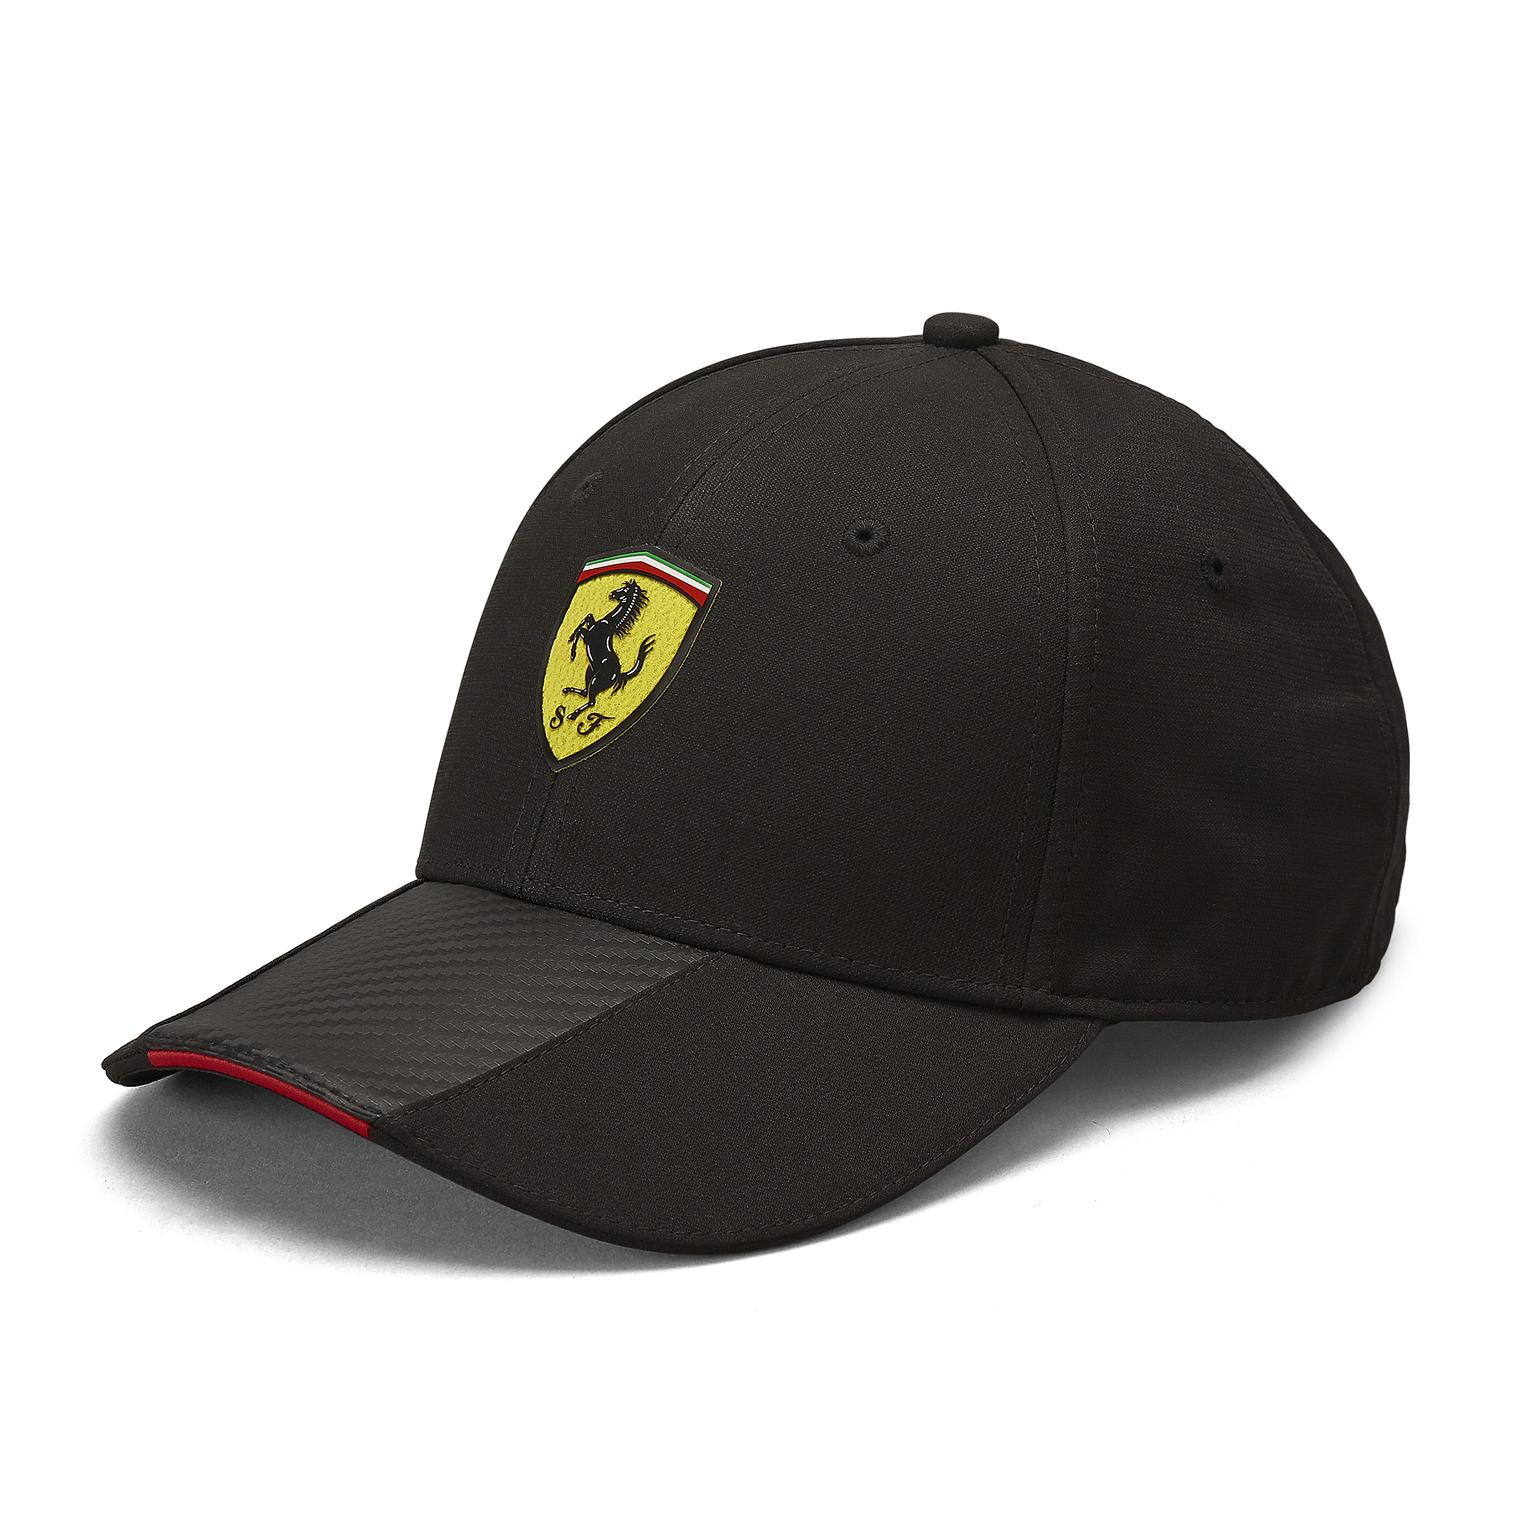 2019 Scuderia Ferrari Carbon Strip Baseball Cap Hat Adults Official Merchandise